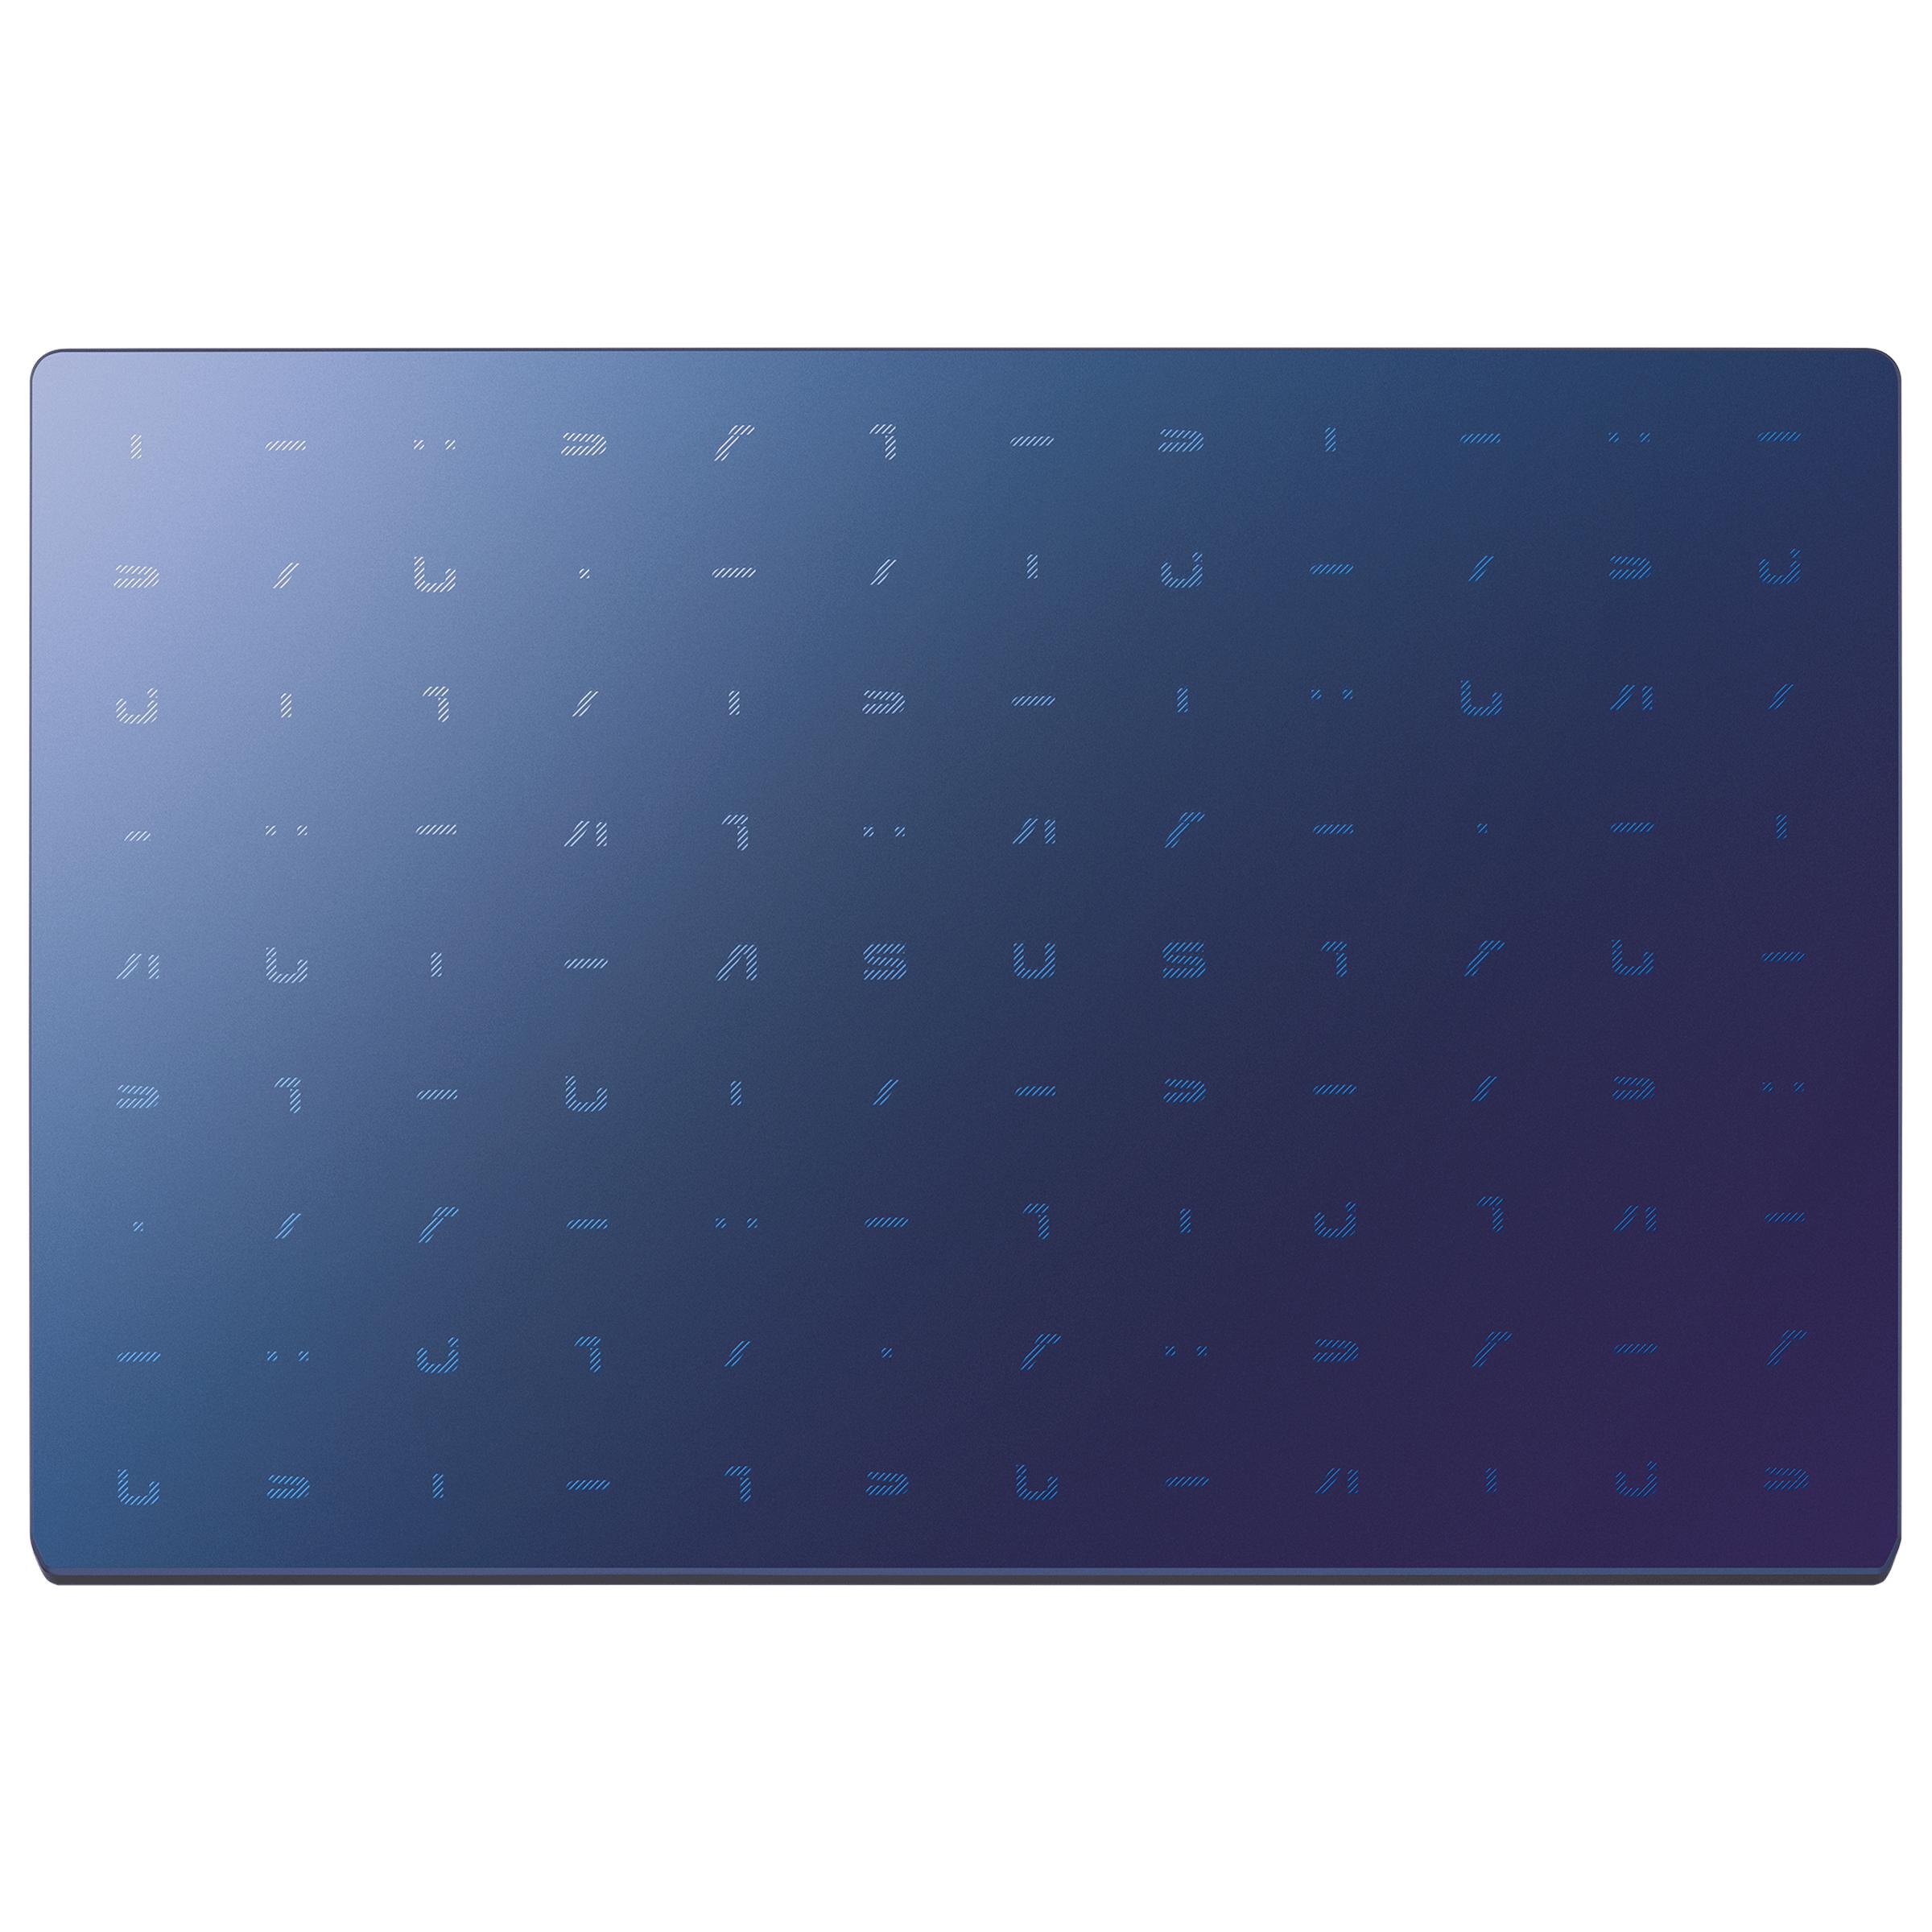 Asus E410MA-EB001T (90NB0Q11-M22940) Celeron Windows 10 Home Laptop (4GB RAM, 256GB SSD, Intel UHD Graphics 600, 35.56cm, Peacock Blue) 6